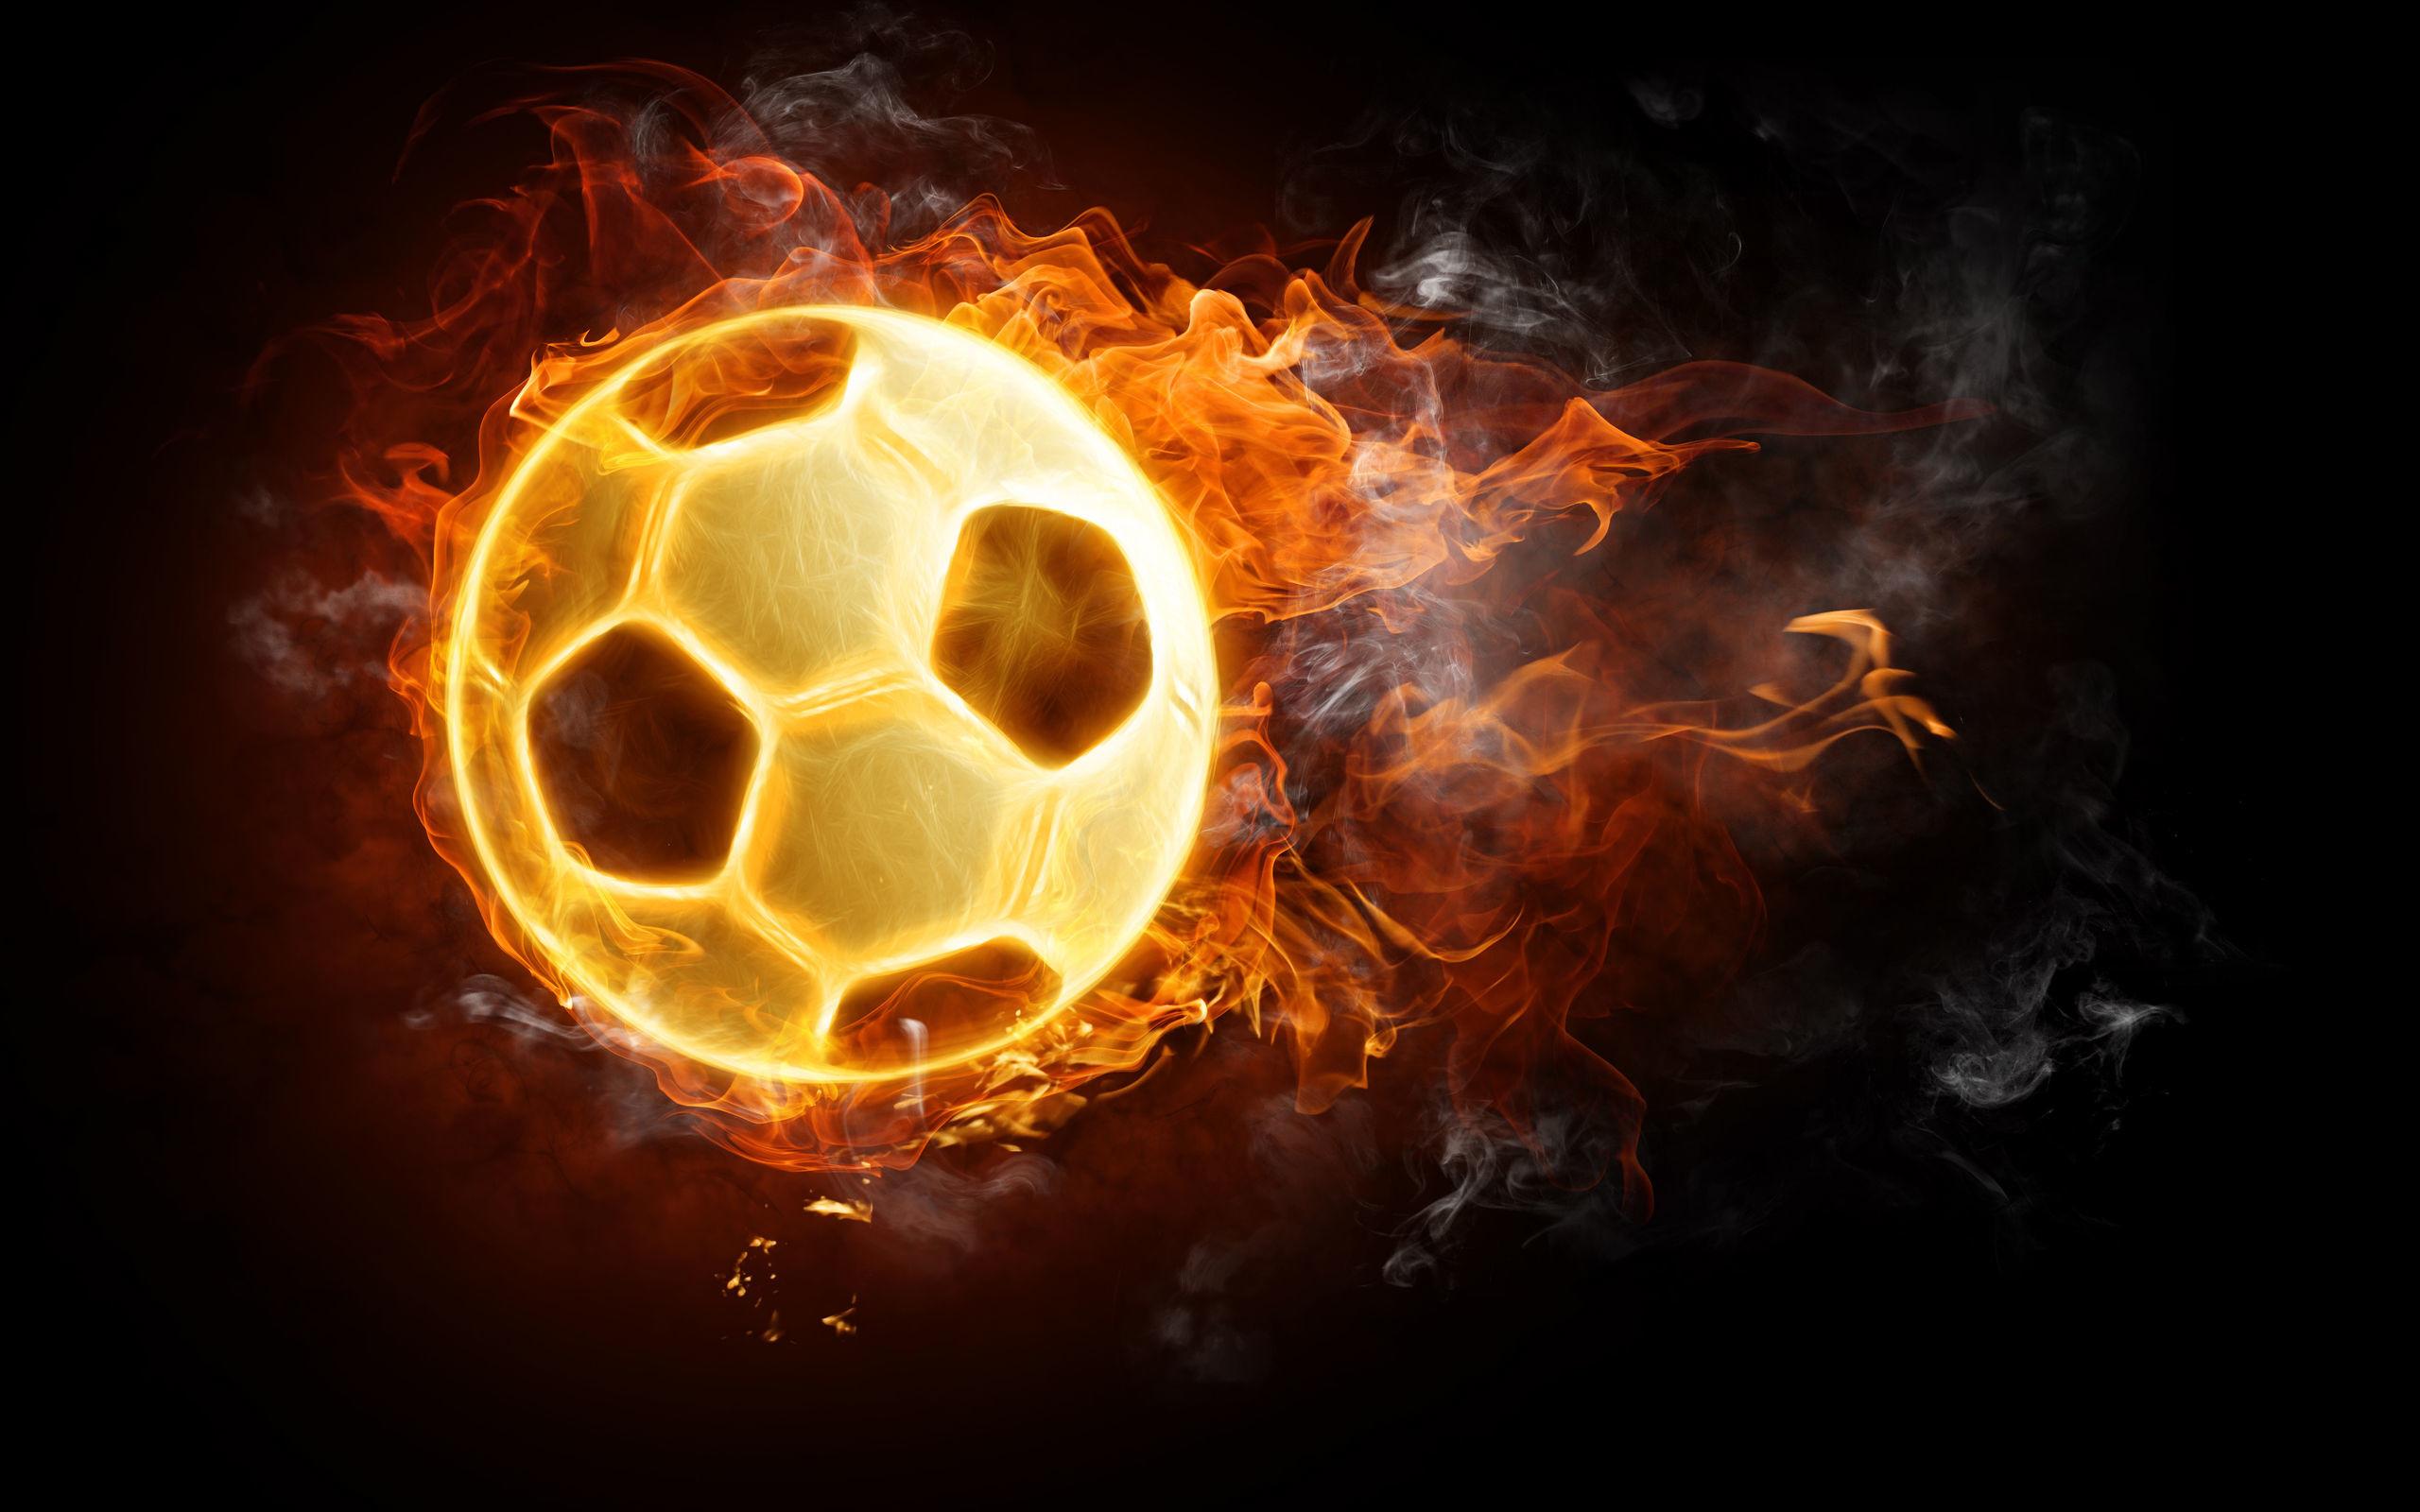 Soccer Ball Wallpaper - WallpaperSafari